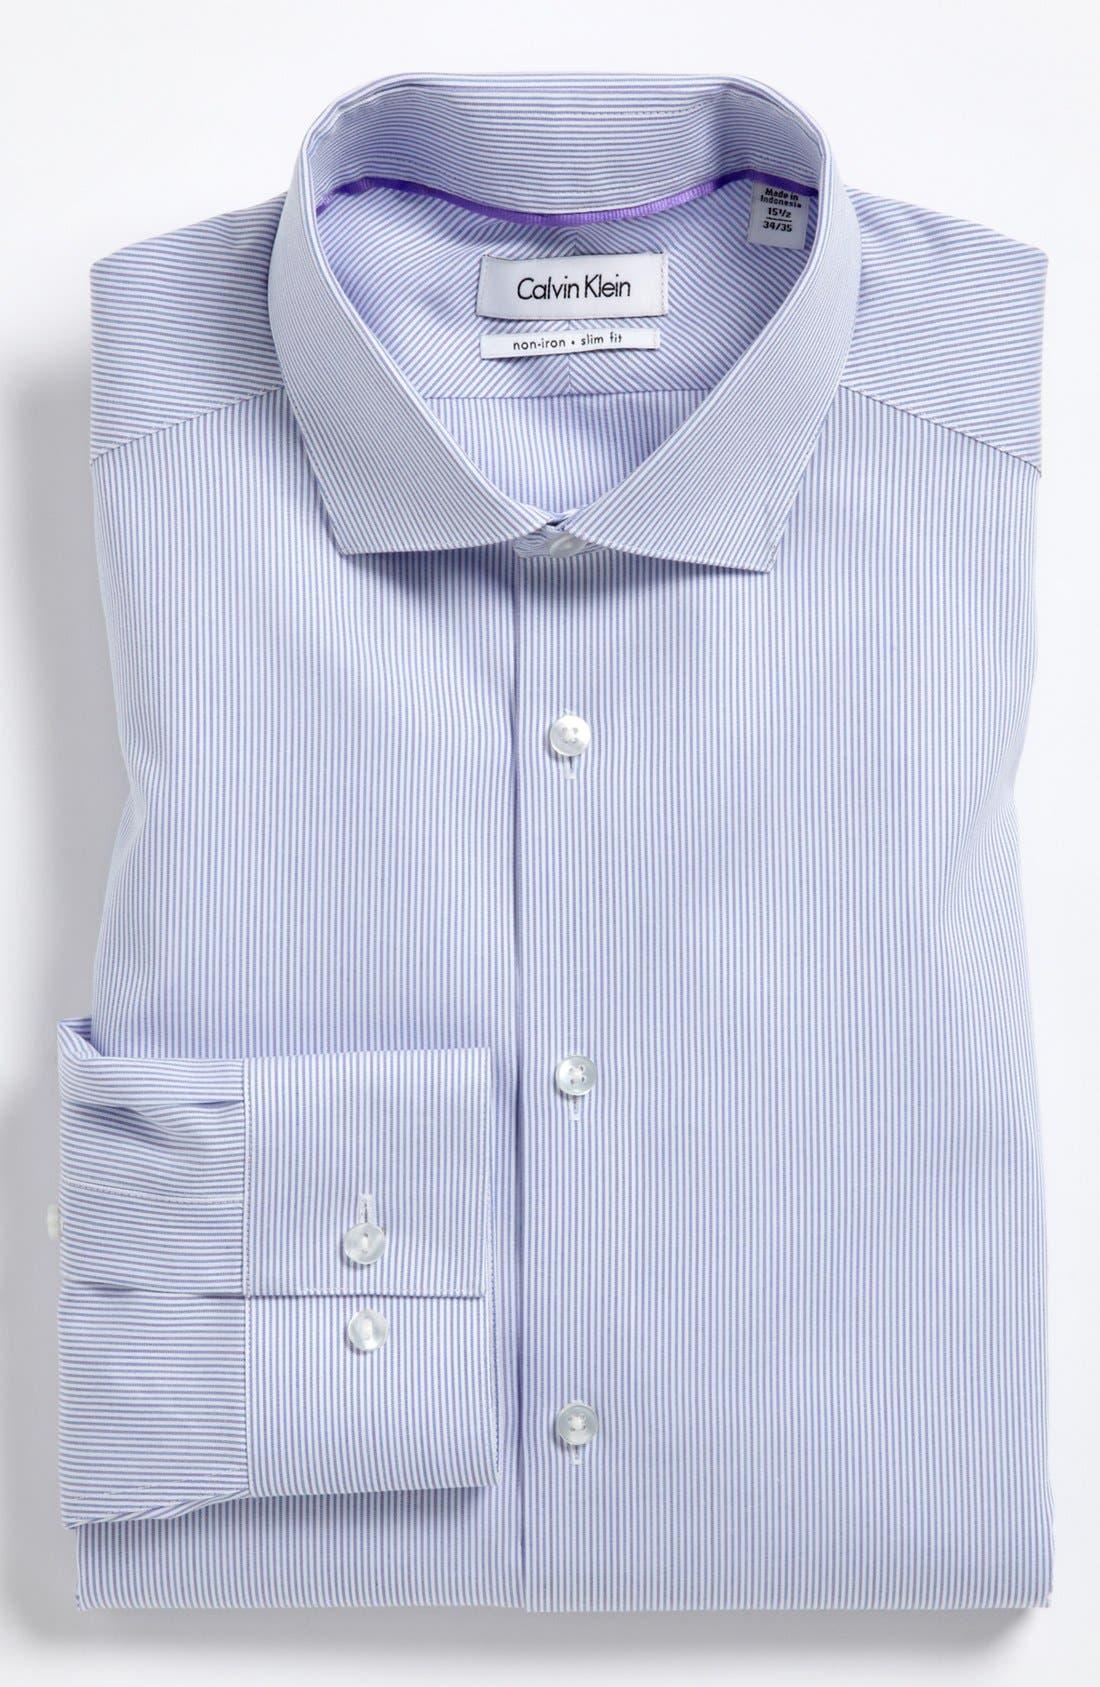 Main Image - Calvin Klein Slim Fit Dress Shirt